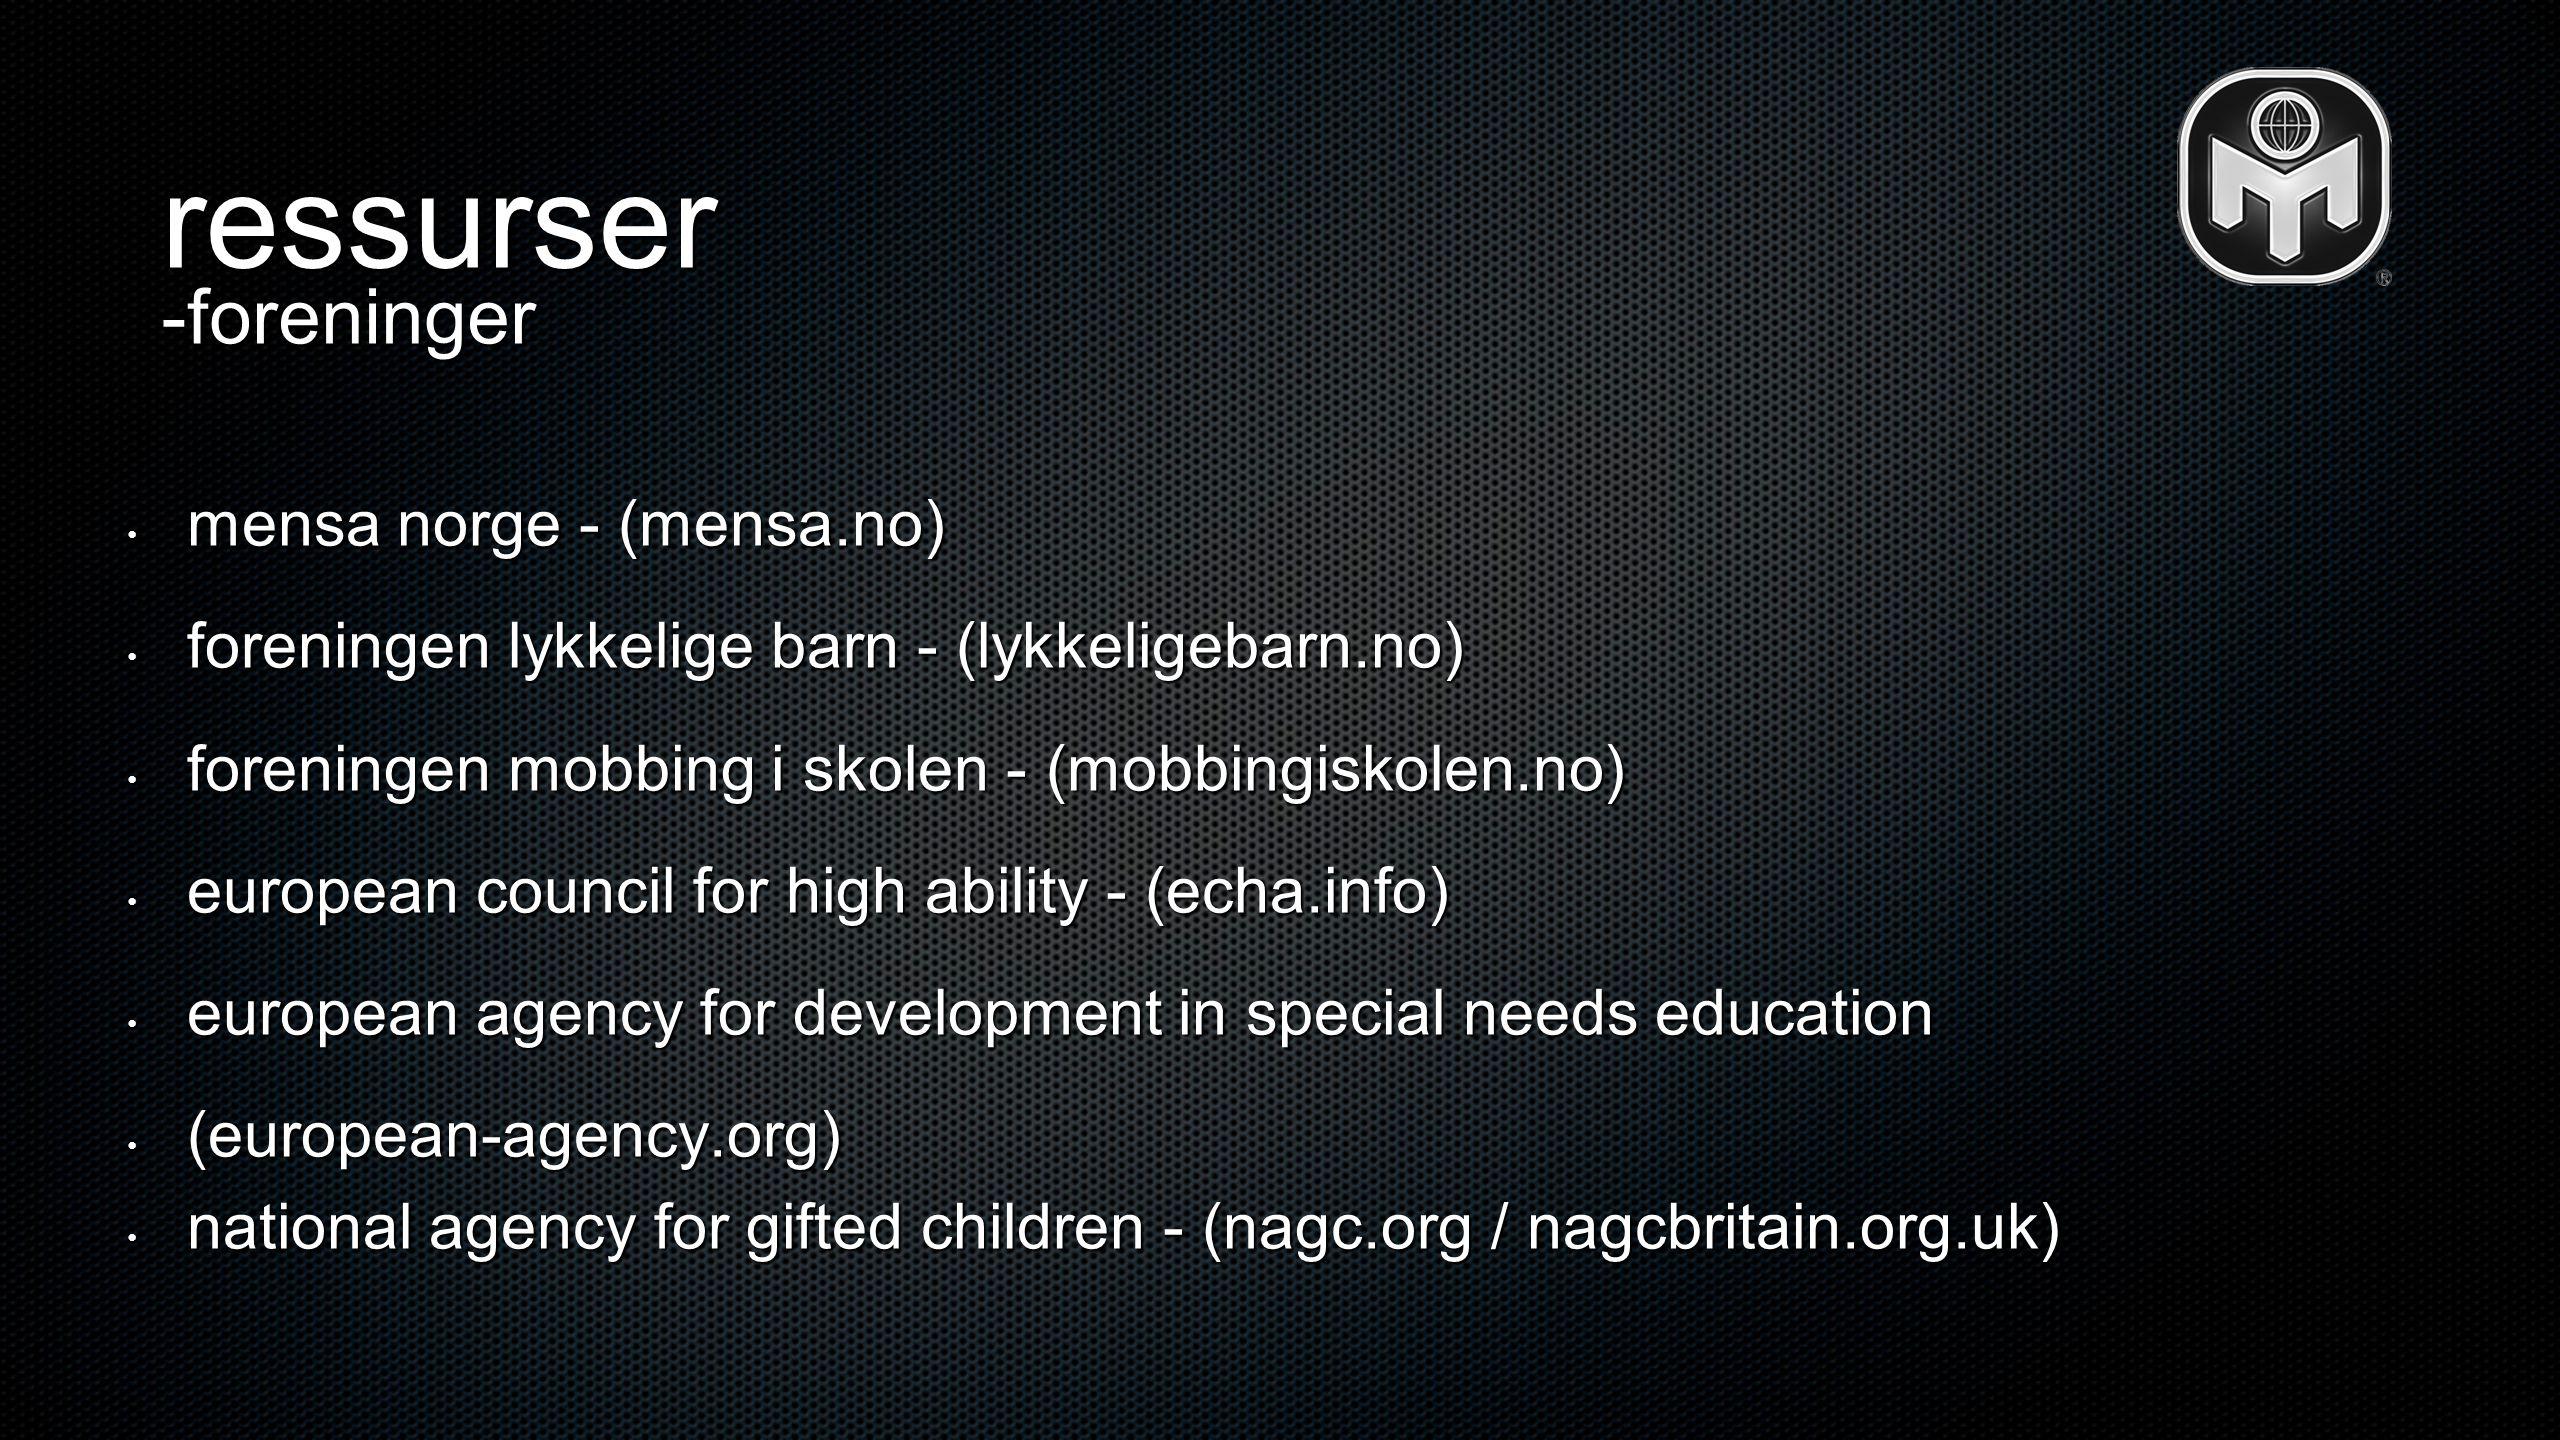 ressurser • mensa norge - (mensa.no) • foreningen lykkelige barn - (lykkeligebarn.no) • foreningen mobbing i skolen - (mobbingiskolen.no) • european c